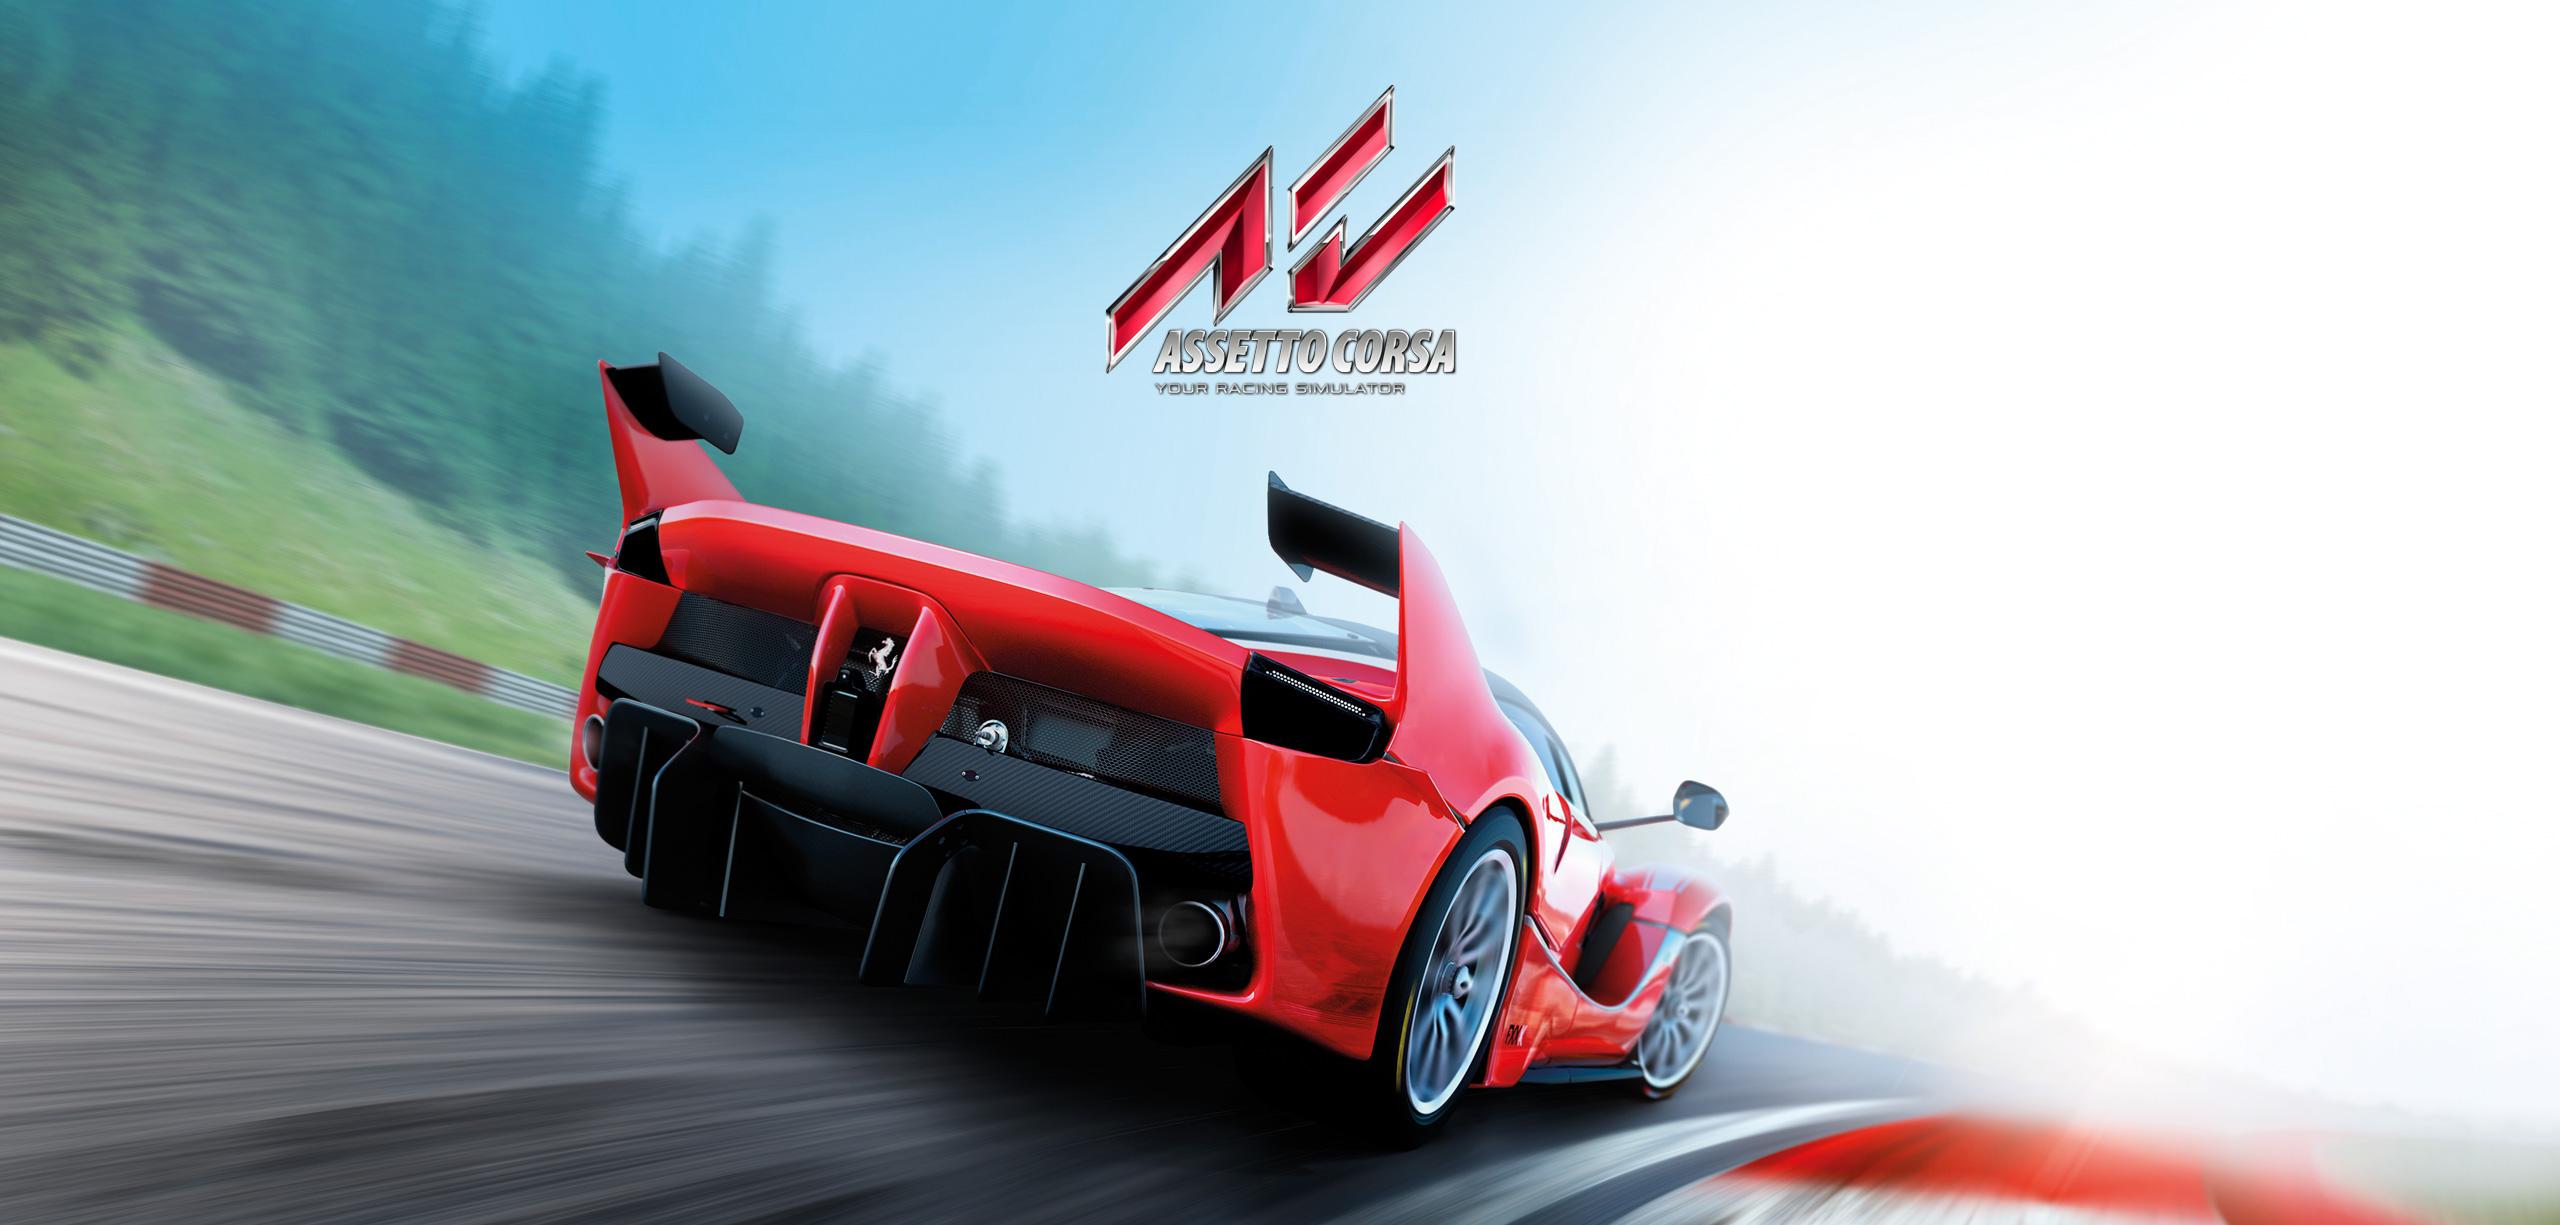 Assetto Corsa artwork with Ferrari FXXK